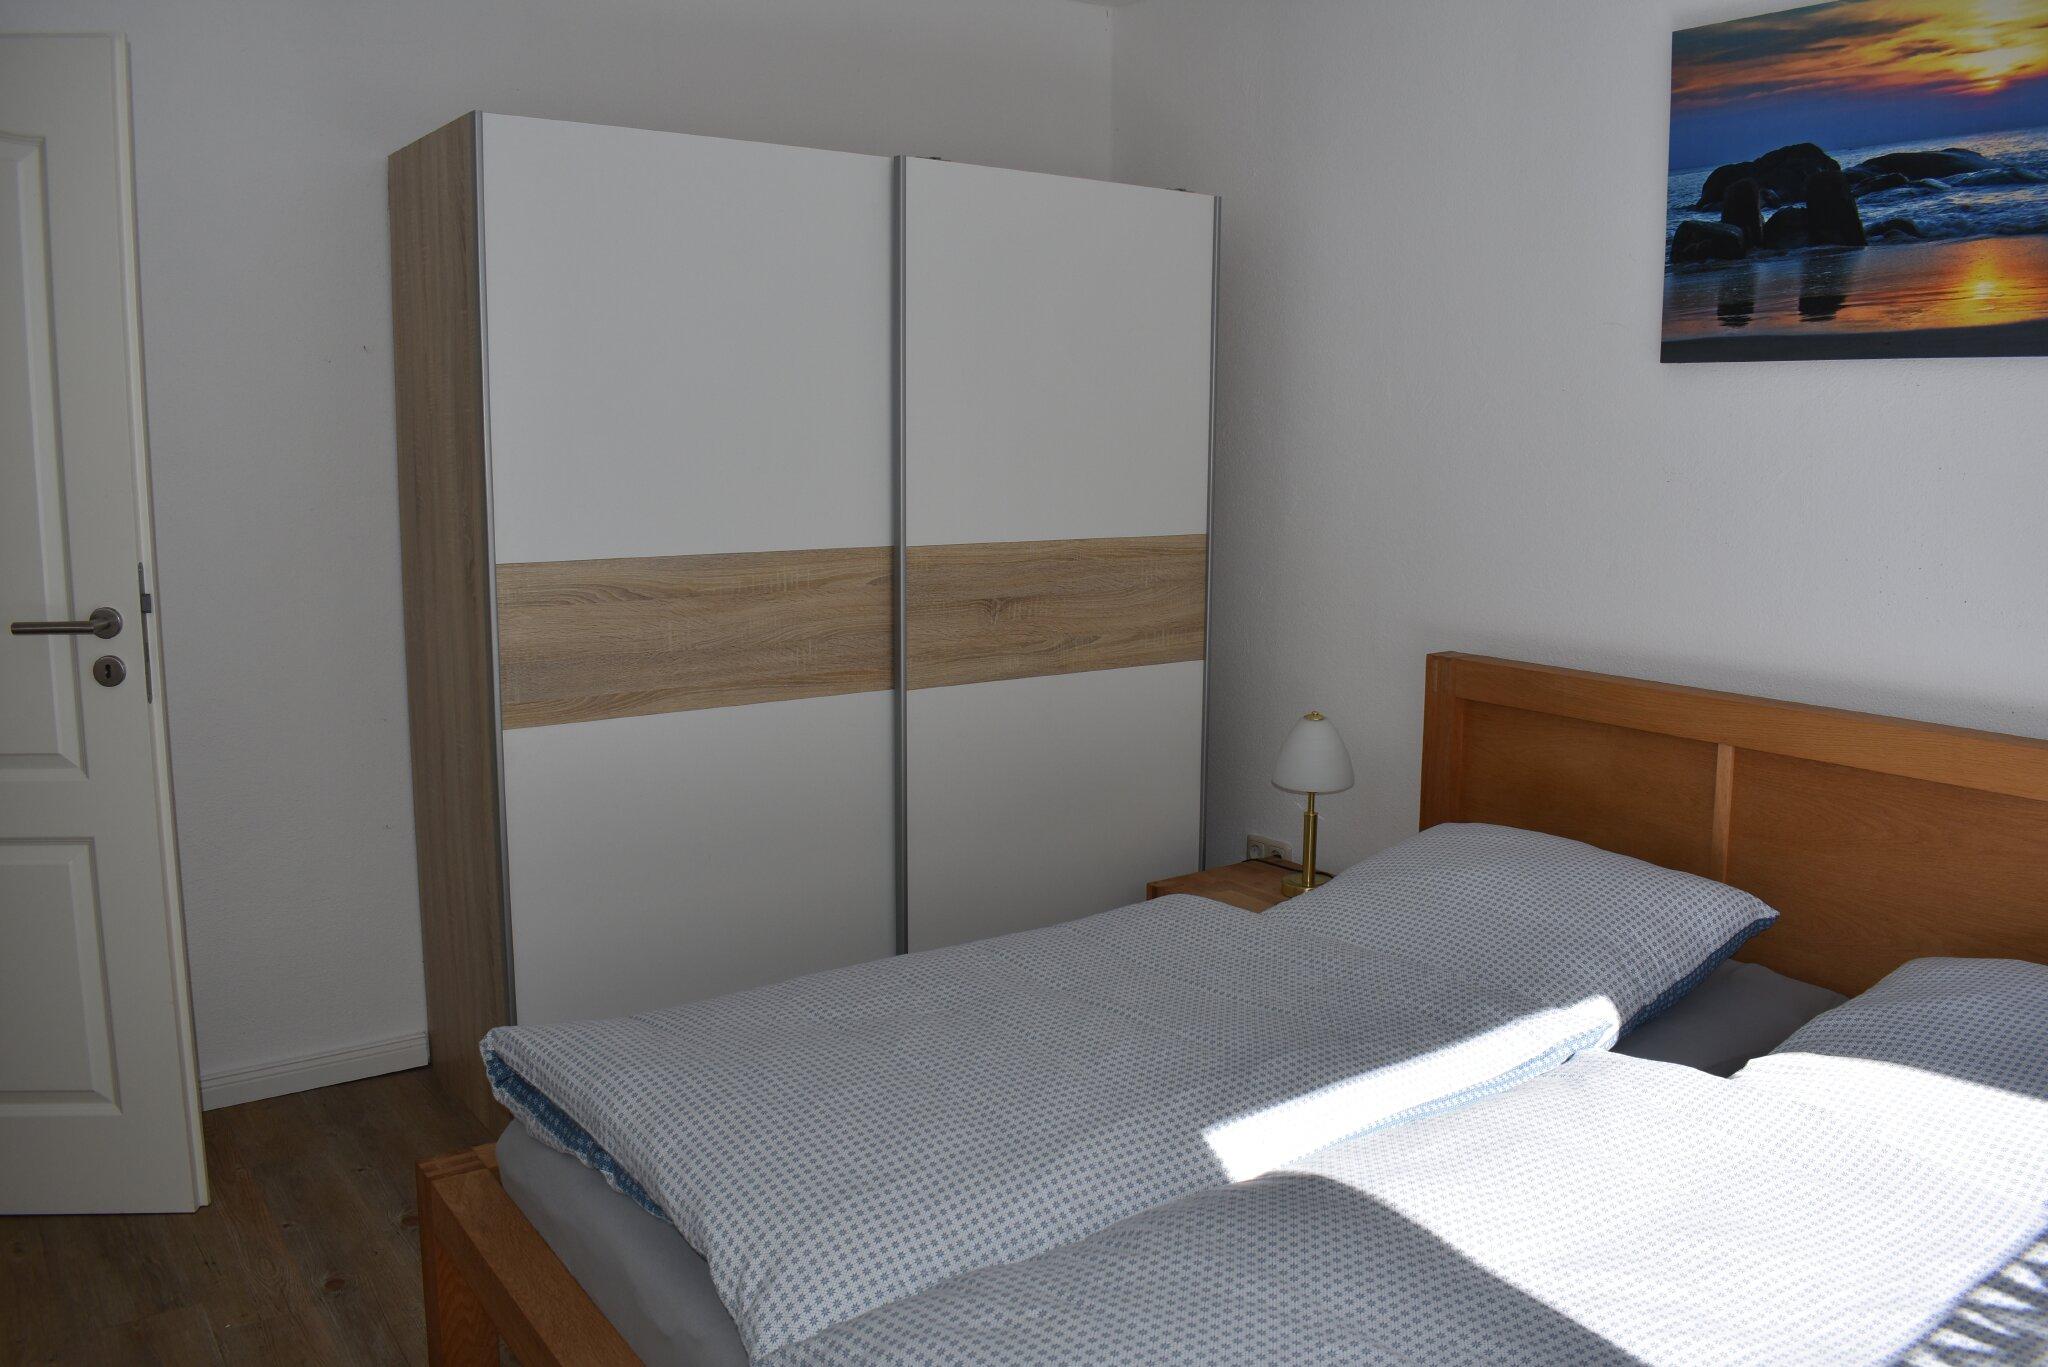 Schlaf-Wohnr�ume u K�che im OG mit 1 DB